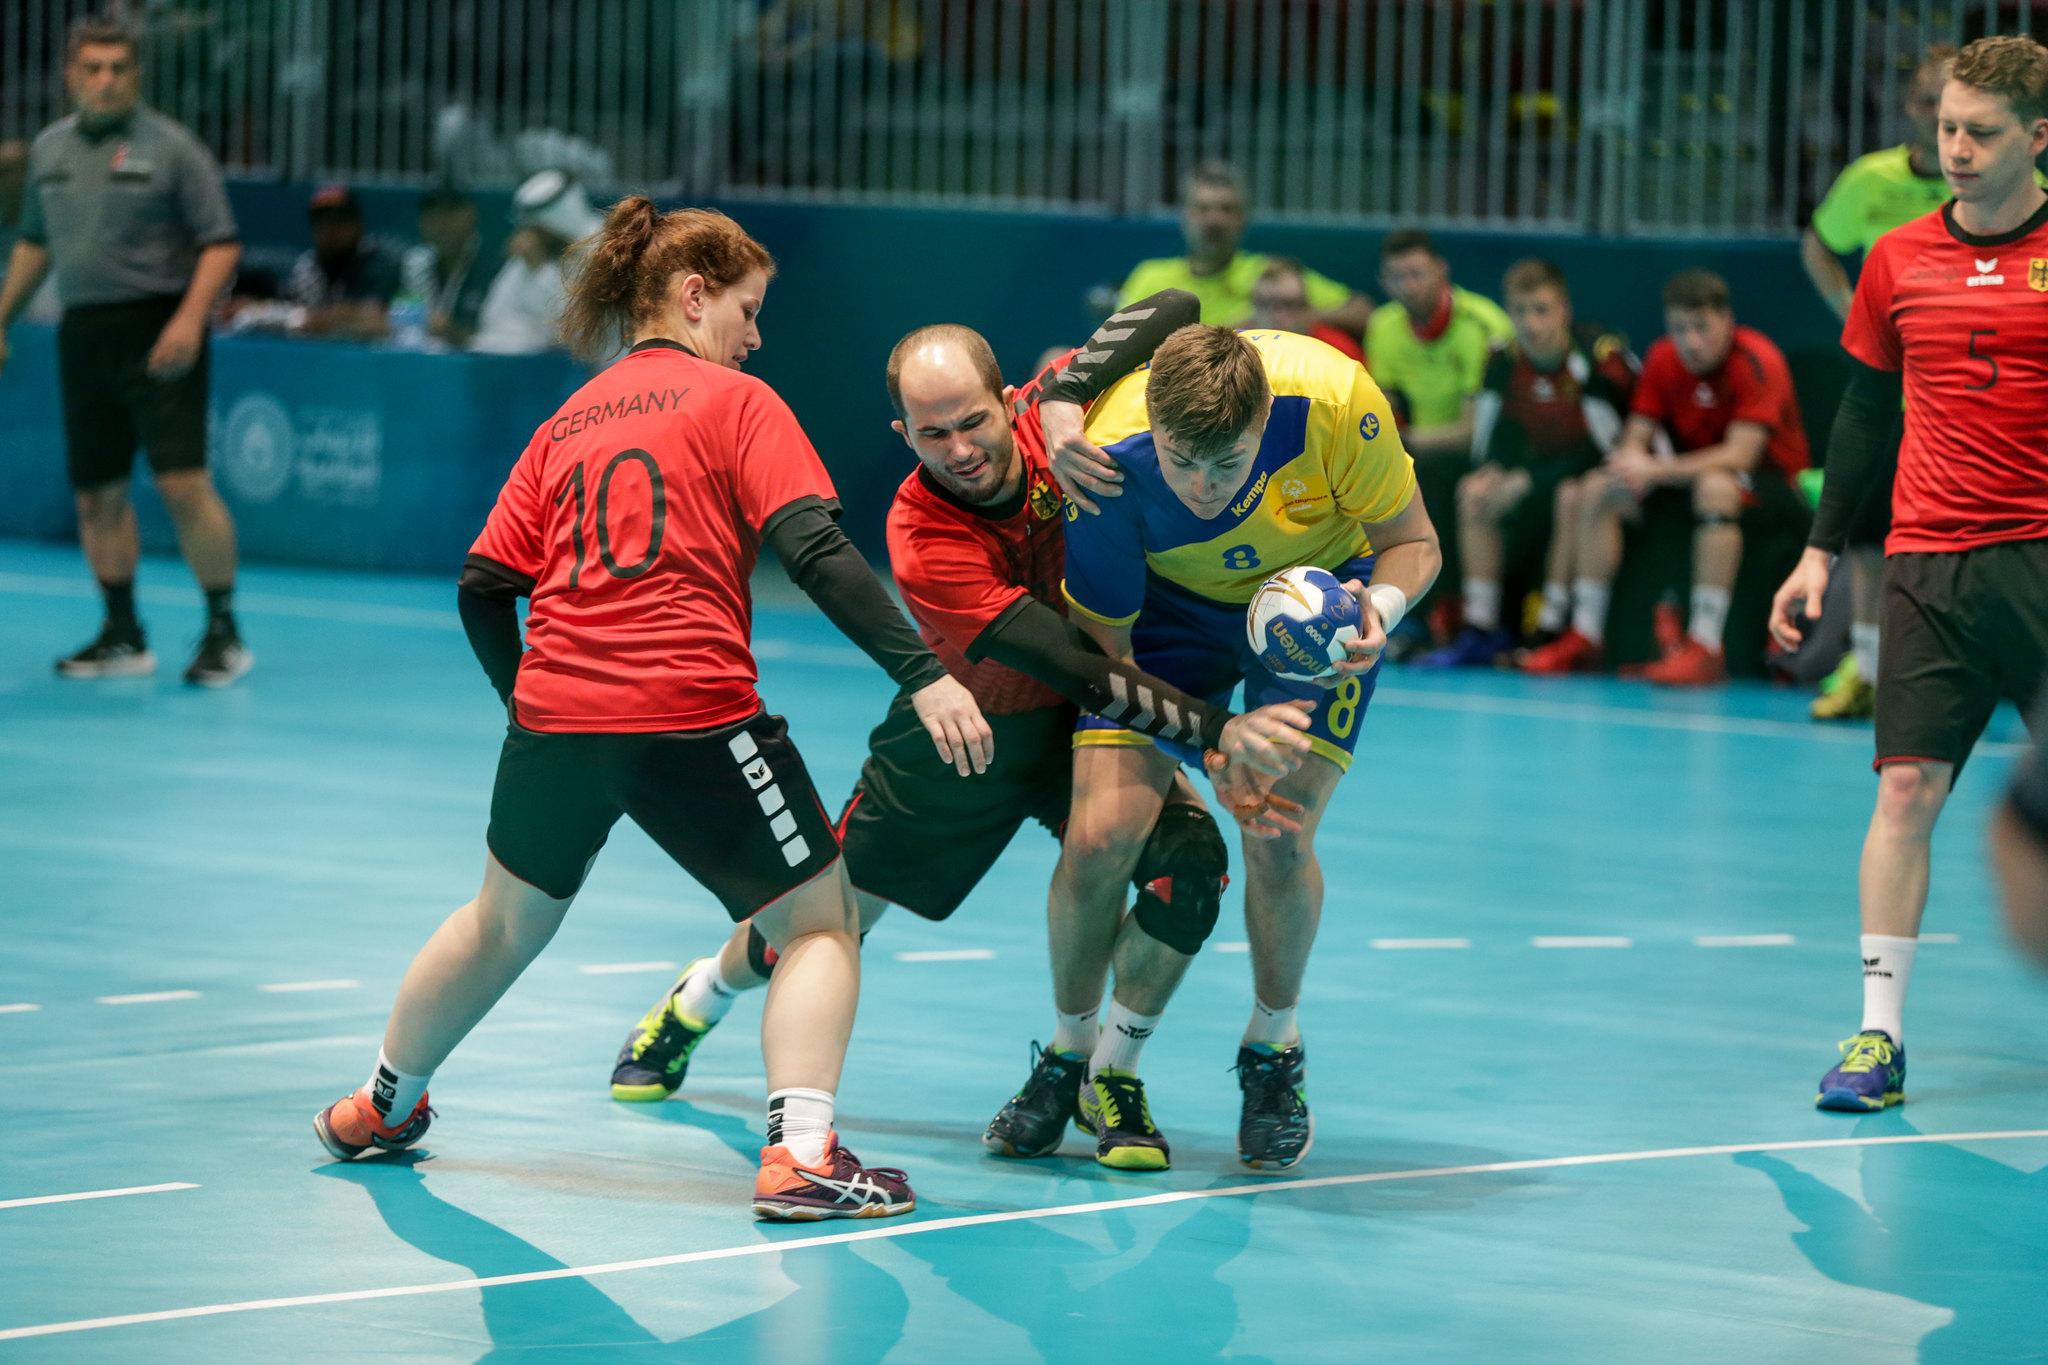 Handball, Special Olympics World Summer Games Abu Dhabi 2019